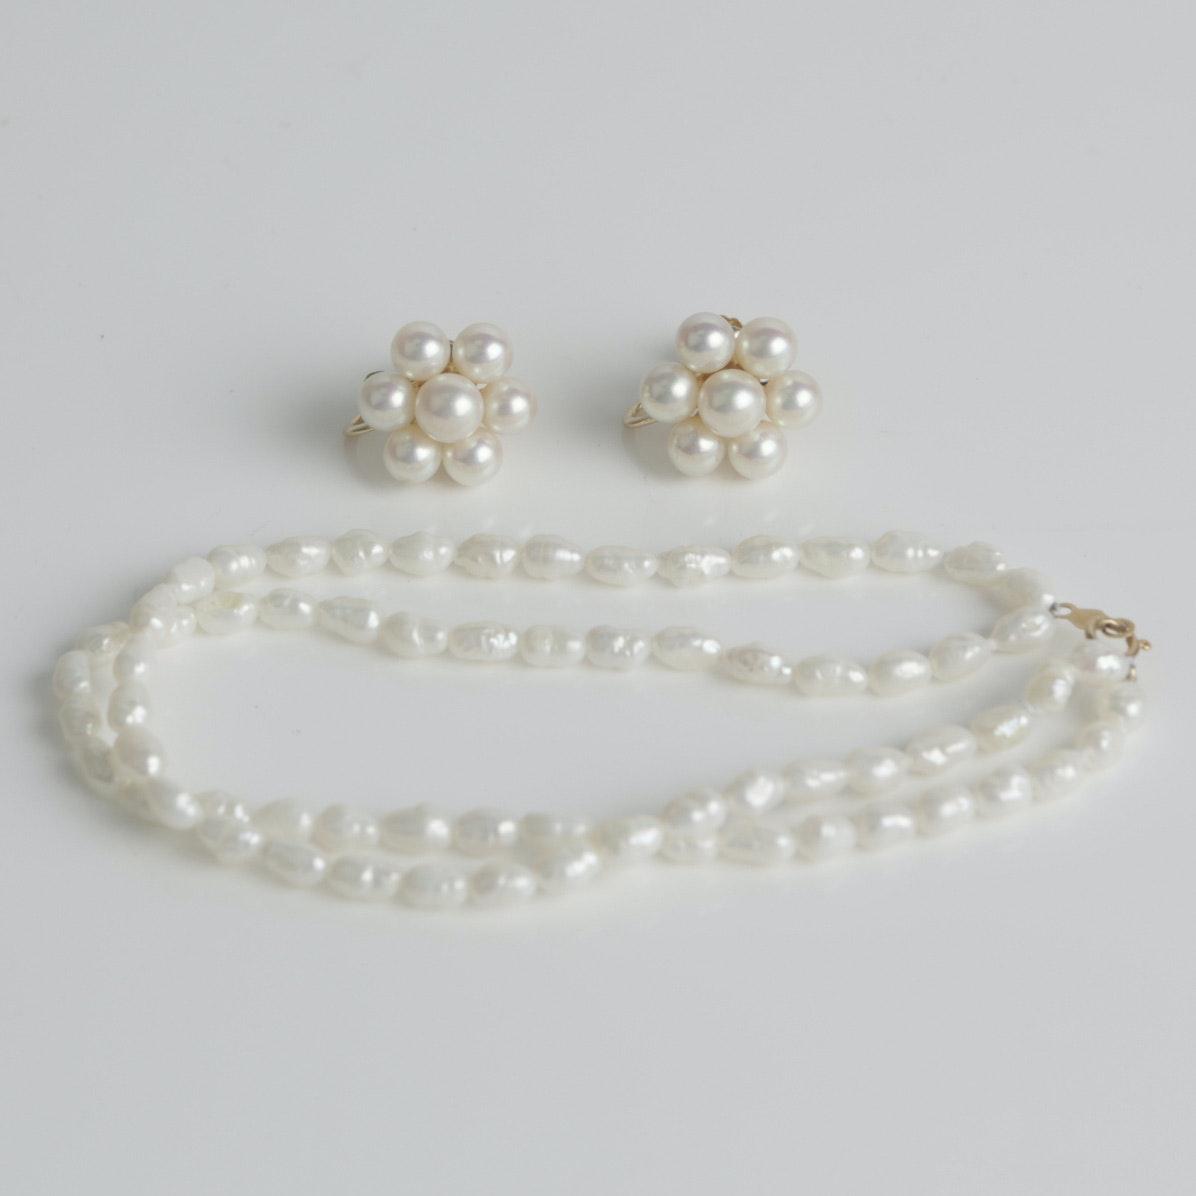 1950s 14K Yellow Gold Freshwater Pearl Bracelet and Earrings